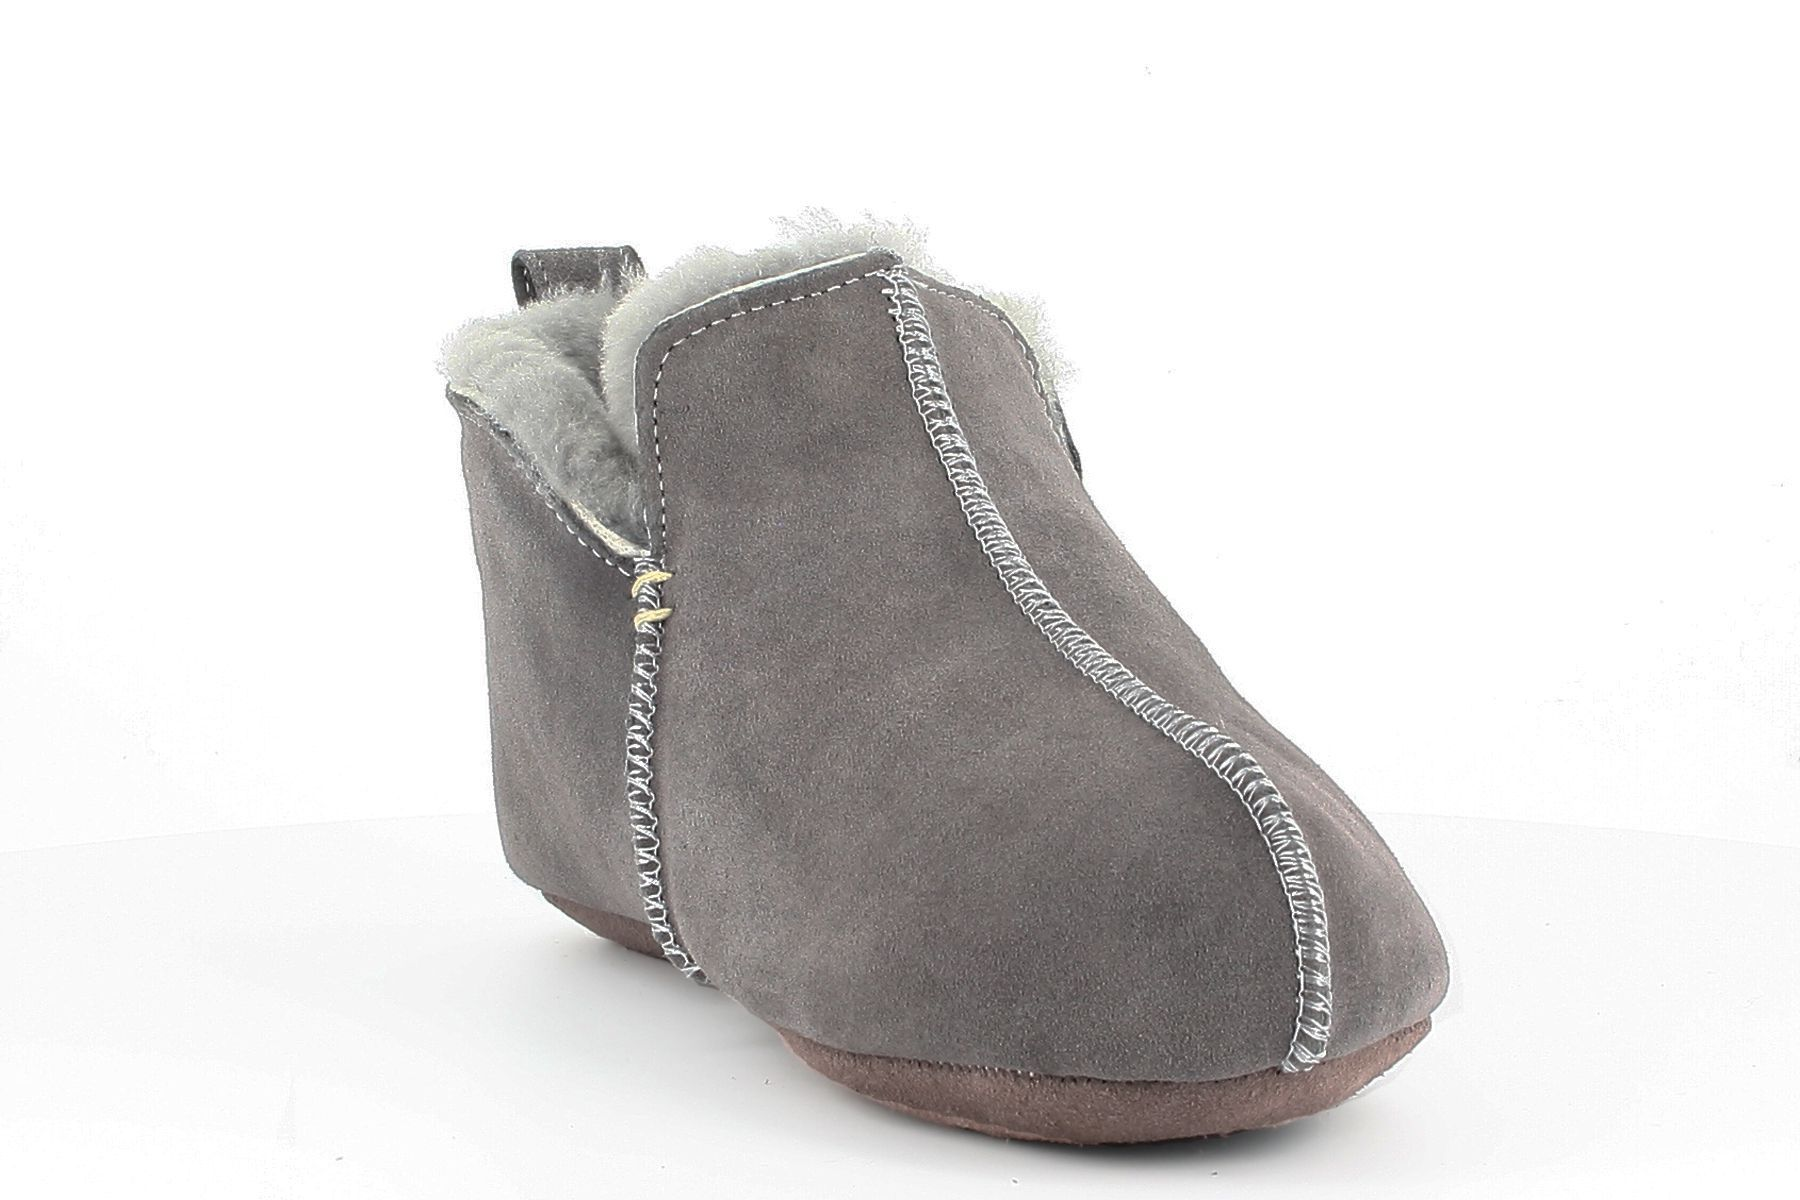 Sheepskin Bootee Slippers in Light Grey